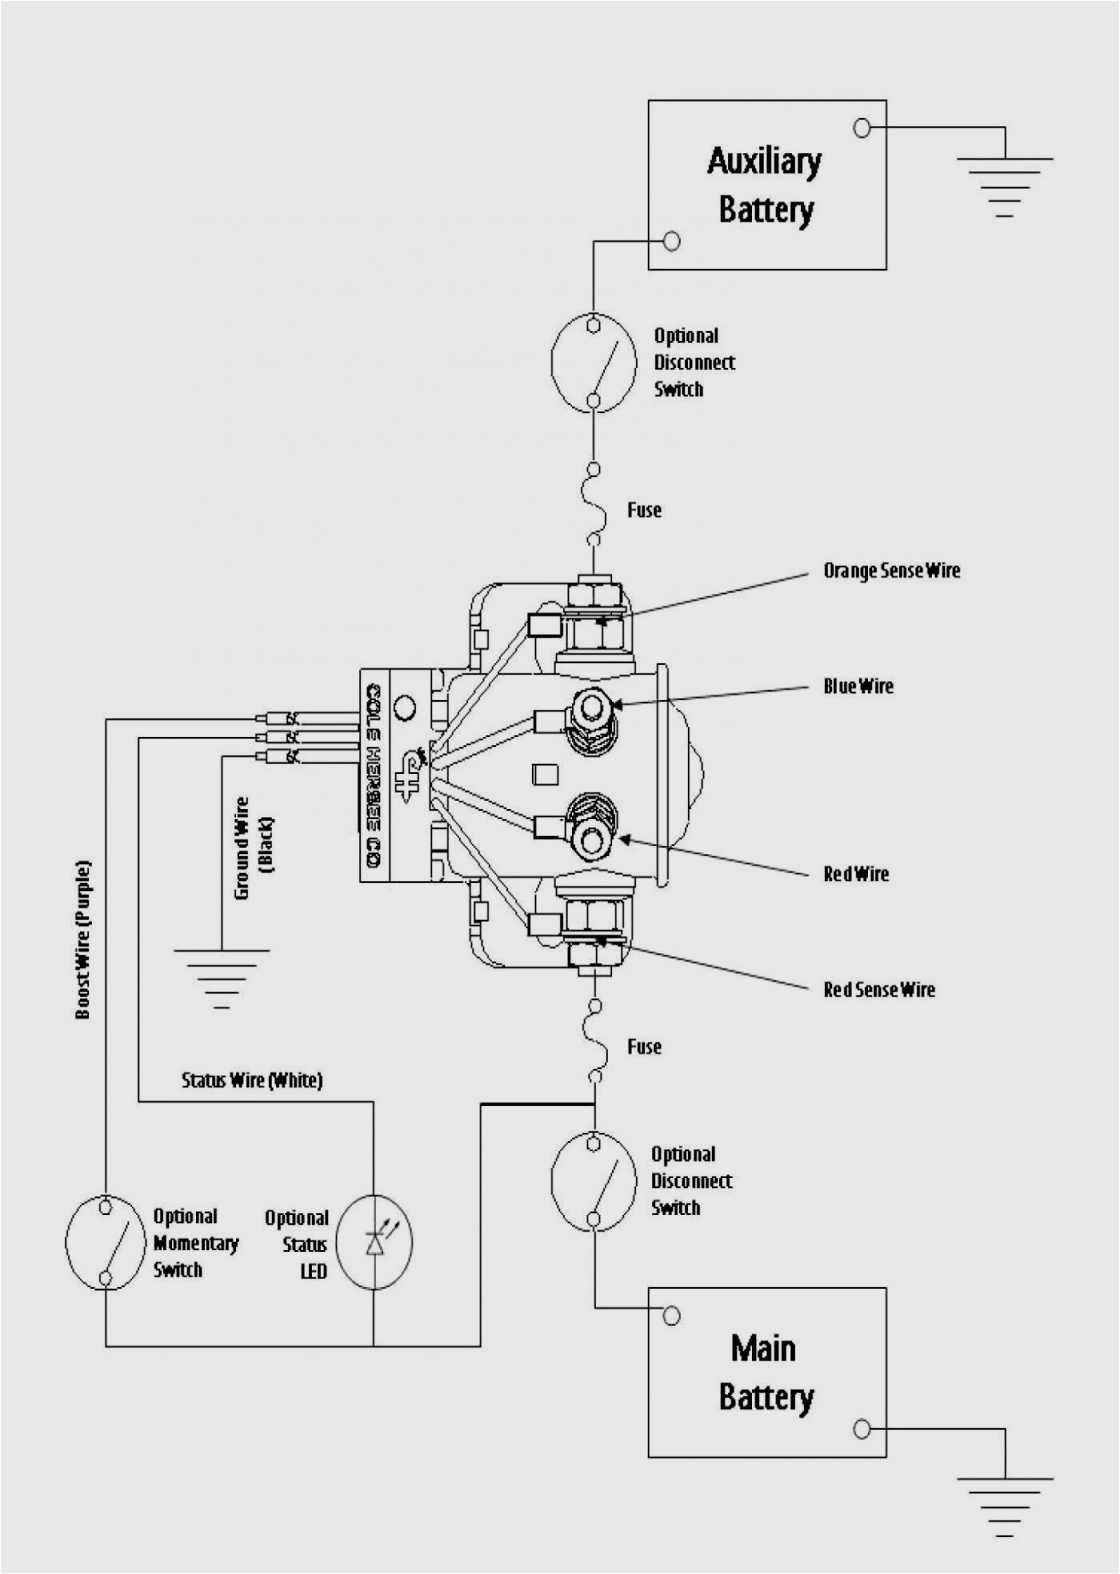 winch wiring diagram chicago electric winch wiring diagram best harbor freight hoist of winch wiring diagram jpg